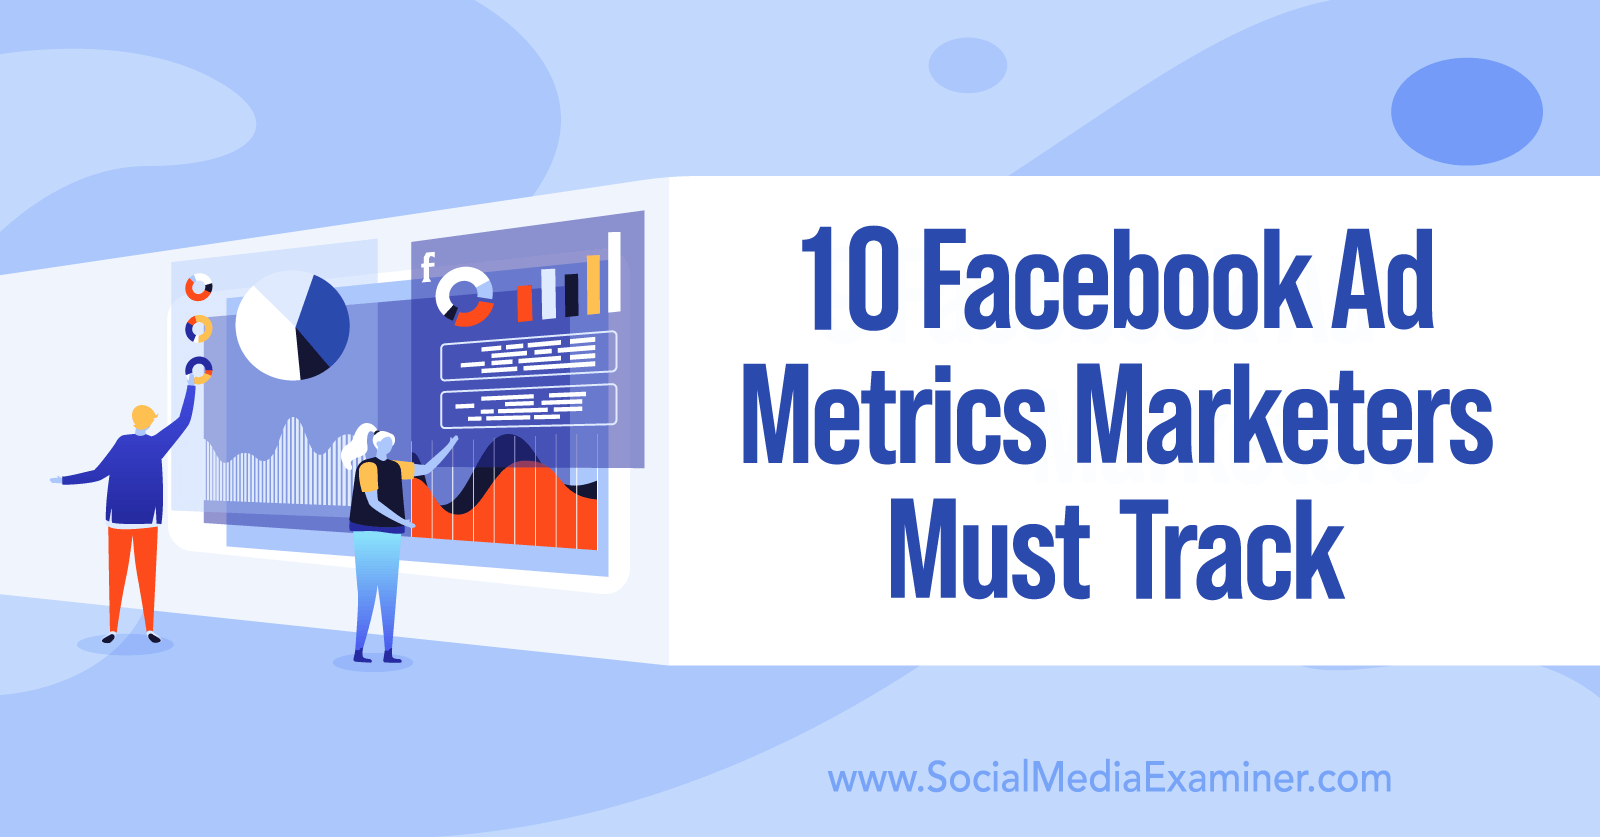 10 Facebook Ad Metrics Marketers Must Track by Charlie Lawrance on Social Media Examiner.